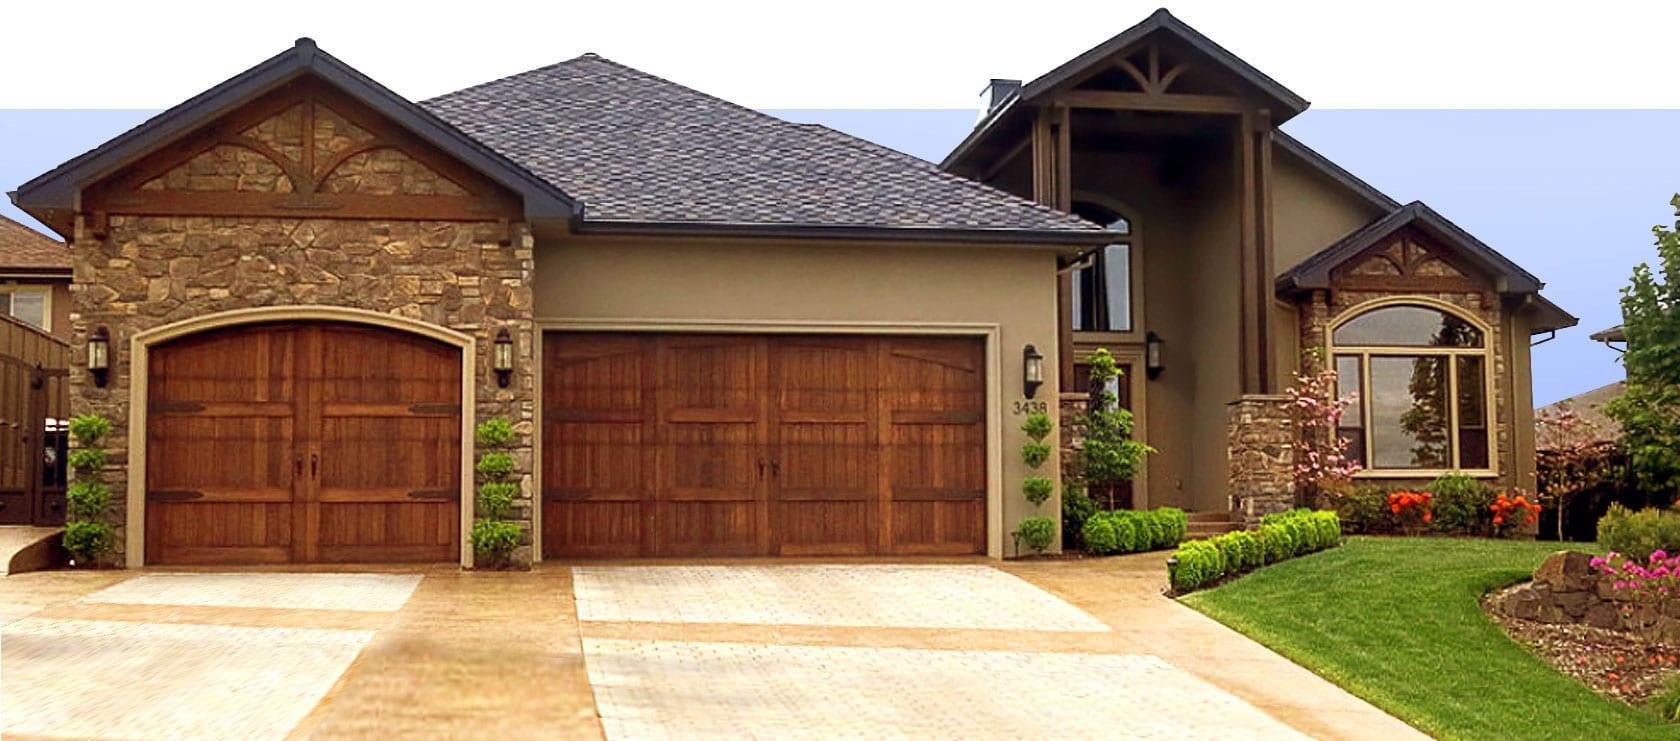 Charmant Garage Doors Medford | Garage Door Repair U0026 Installation Medford